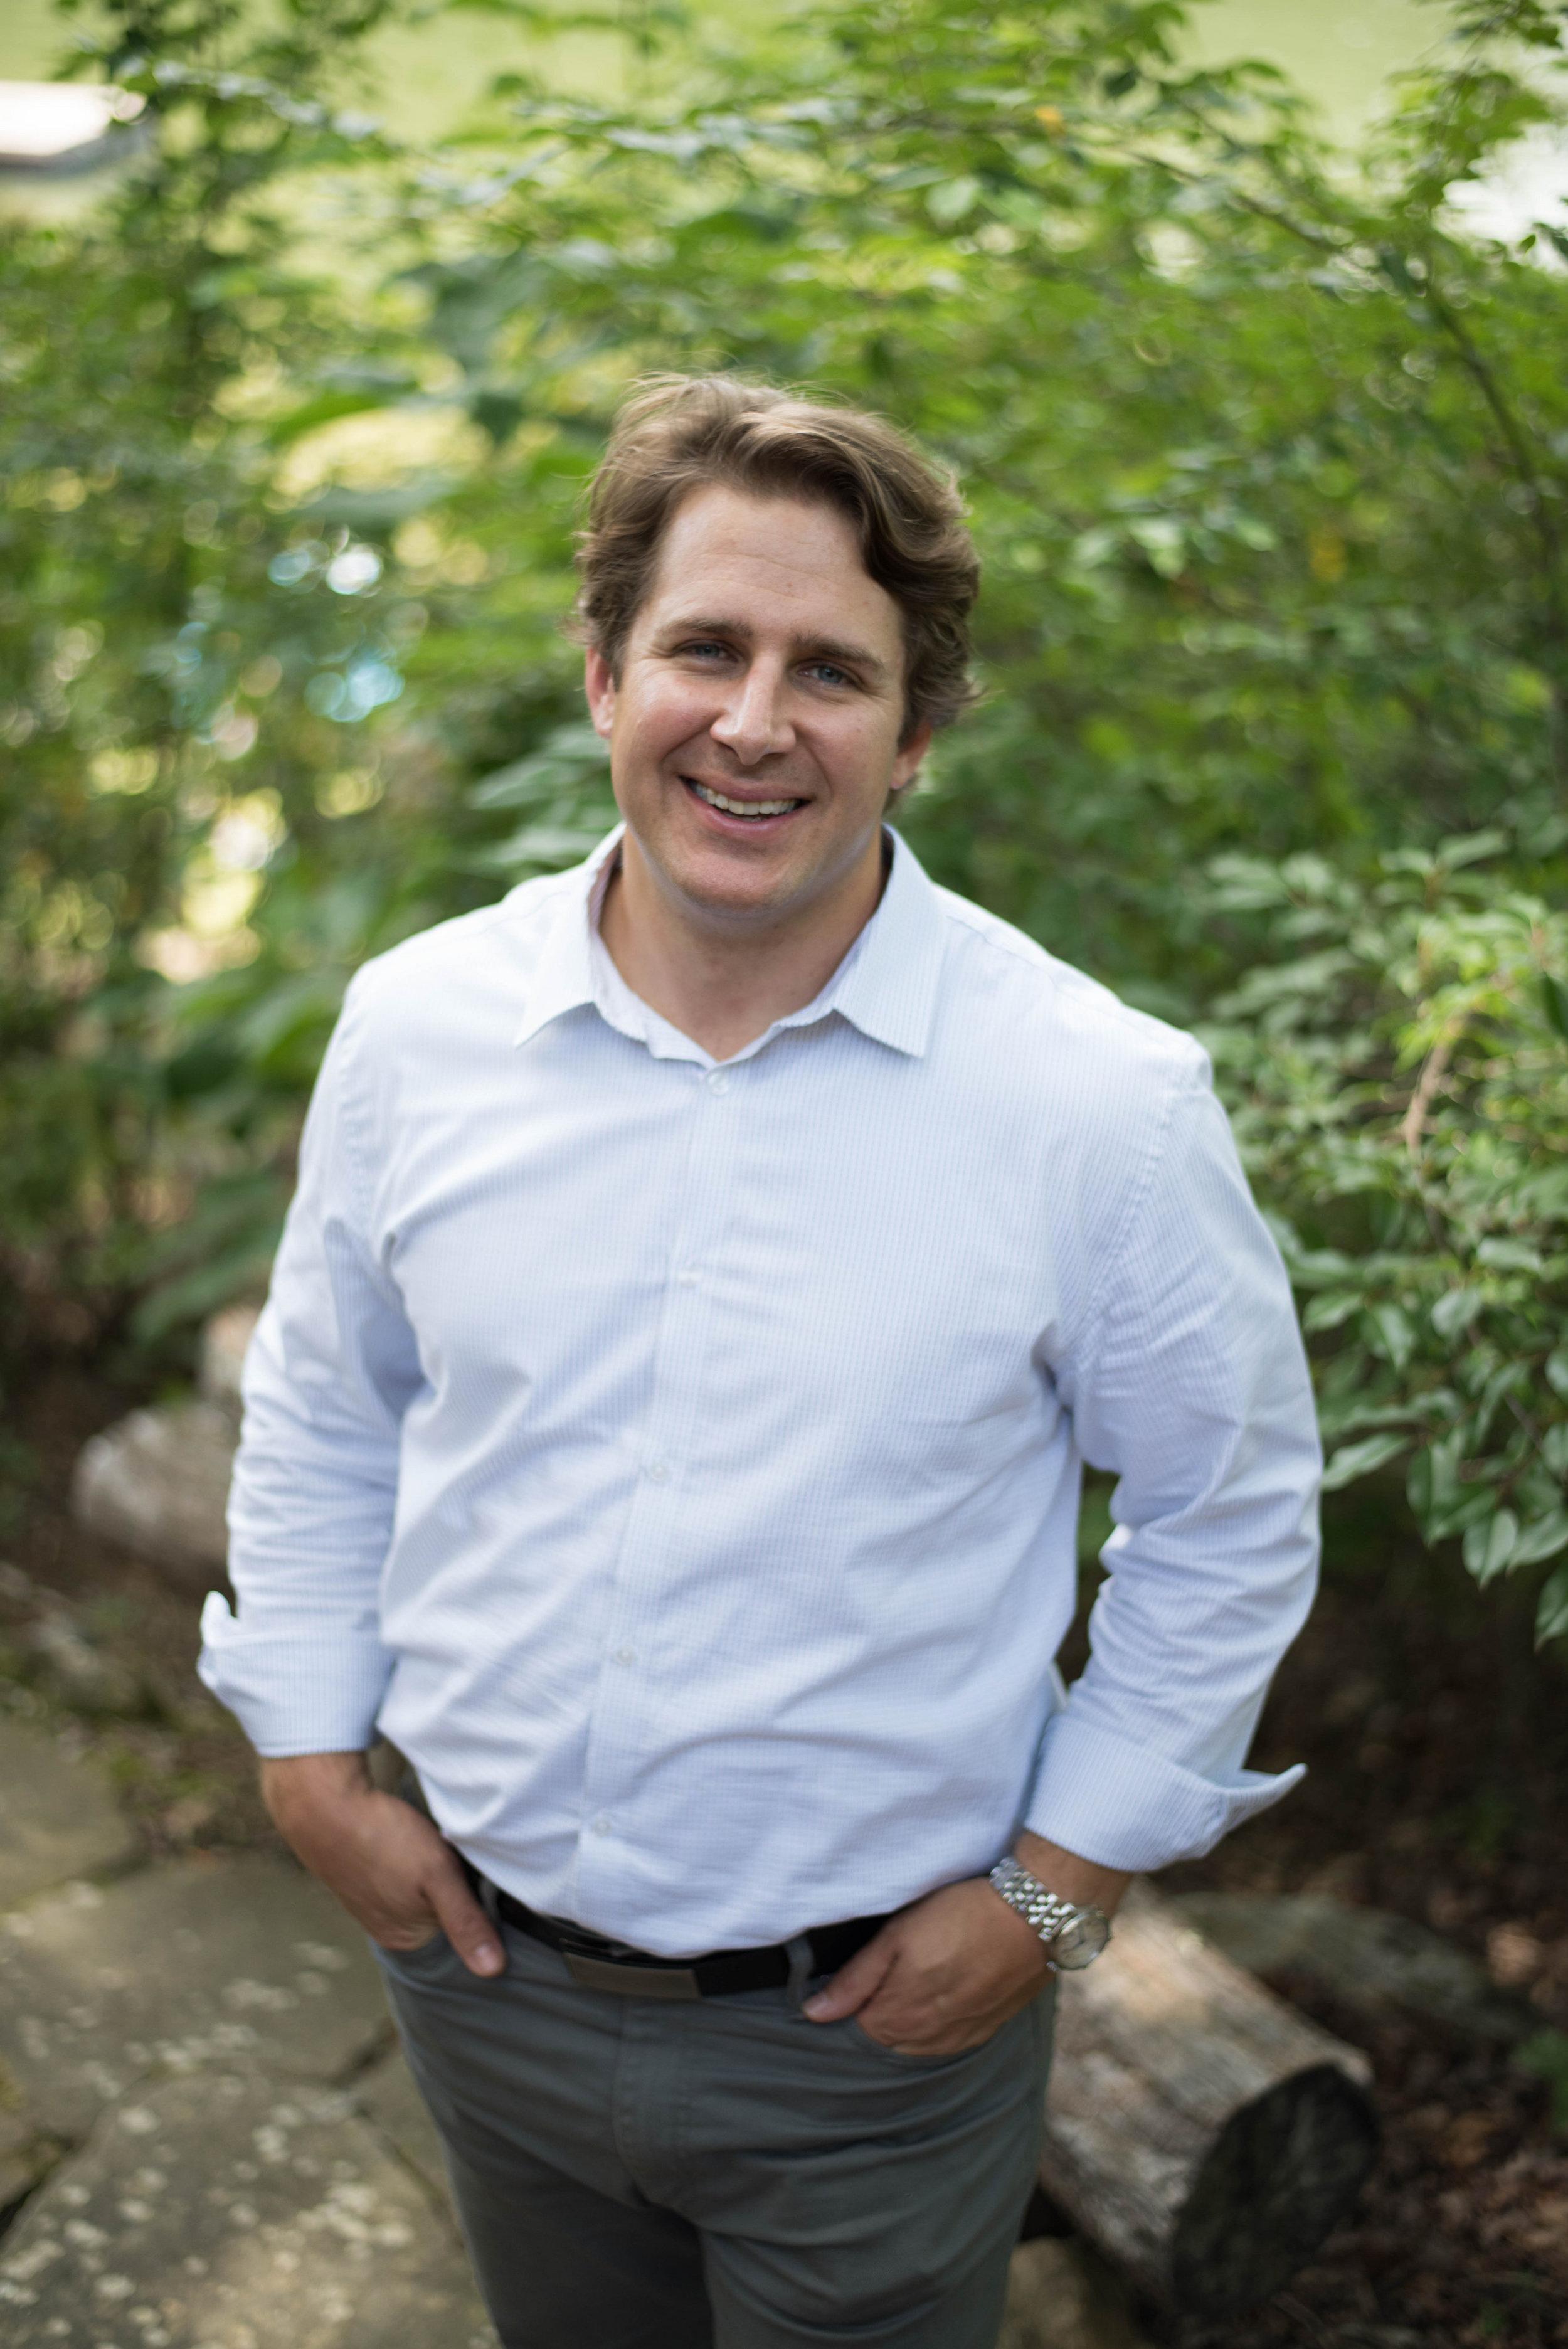 Josh Pedersen, President and Founder of Vox Bivium